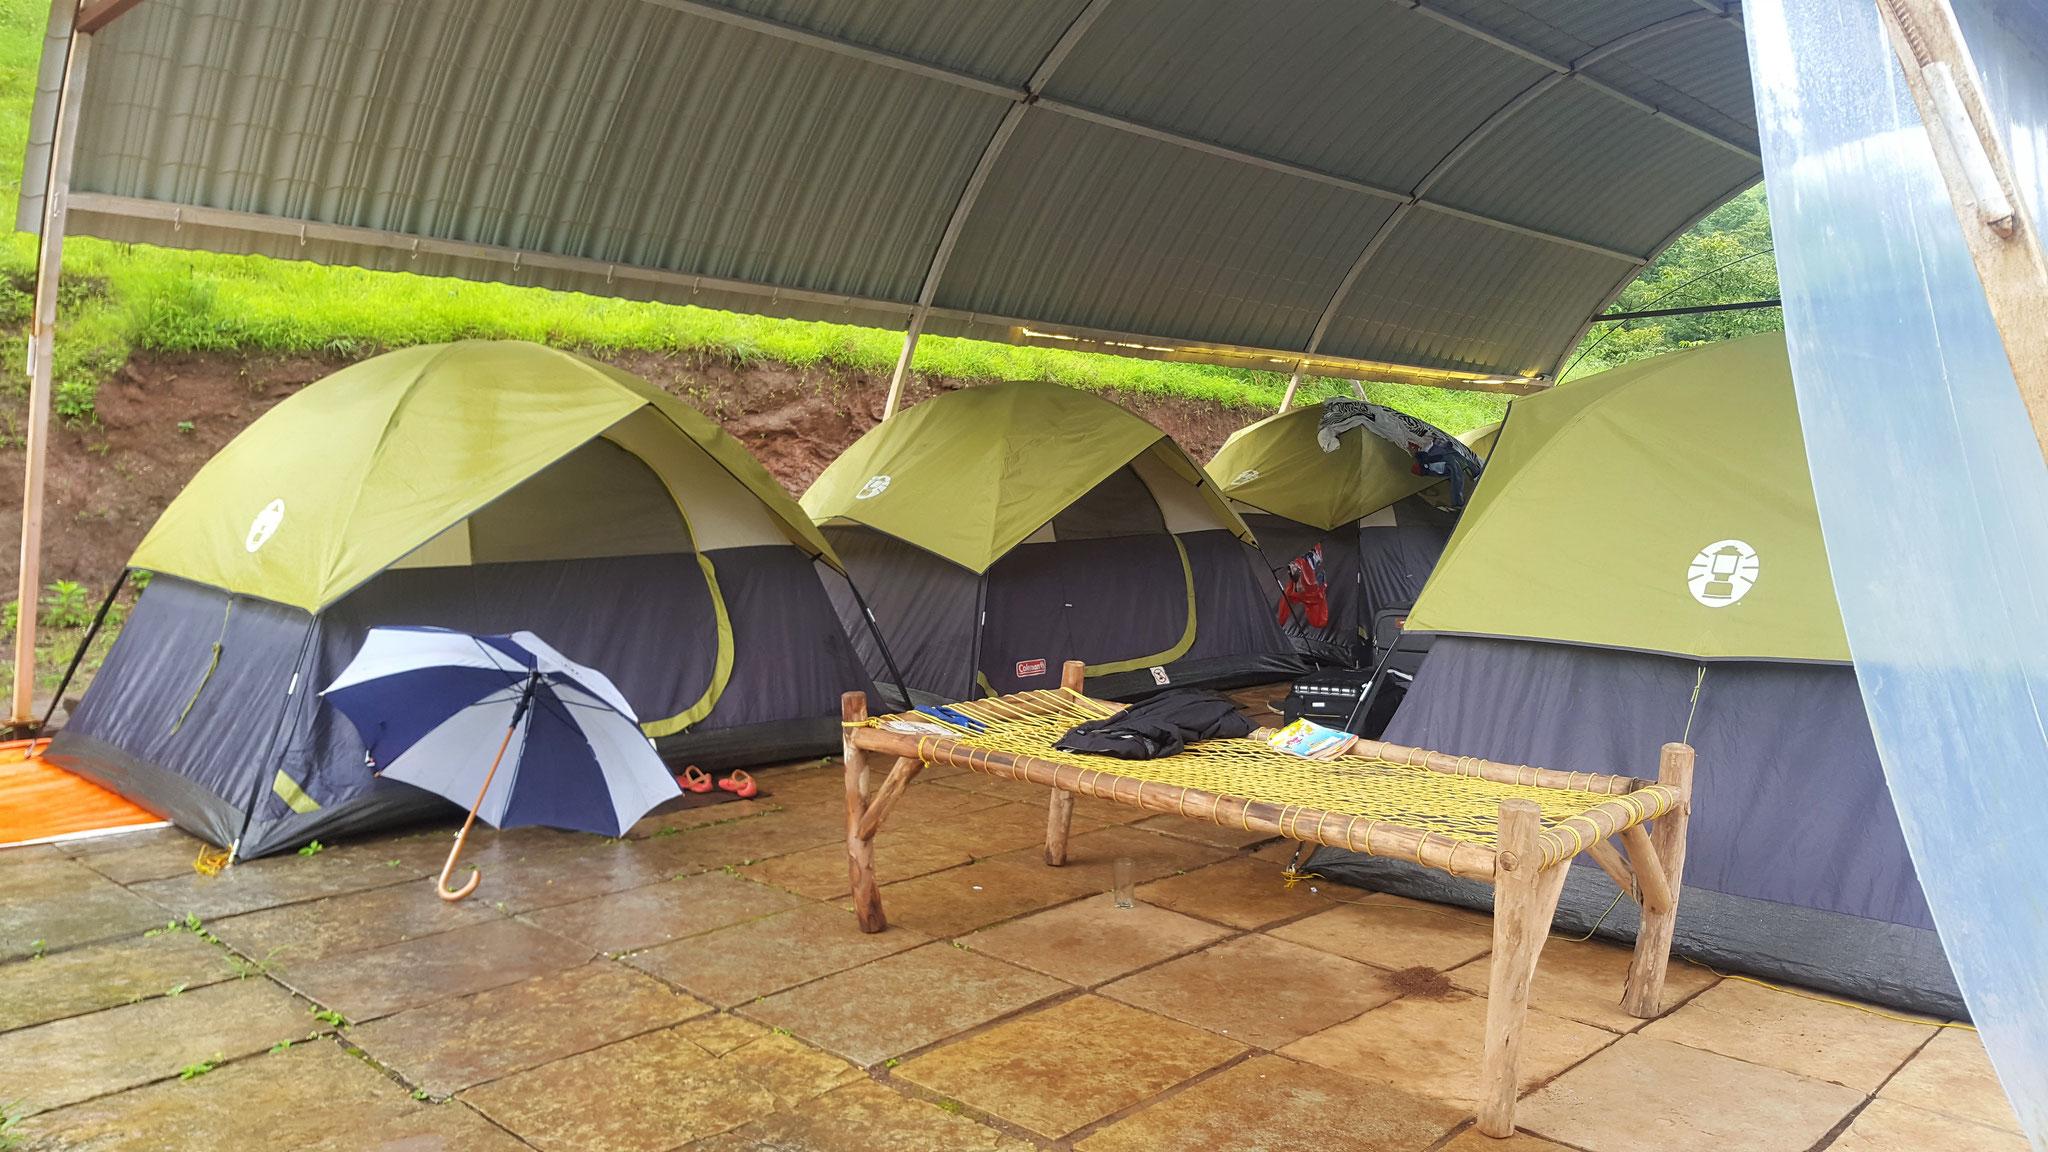 Campingplatz Deluxe: Zelten geschützt vor dem Monsun, richtig outdoorsy